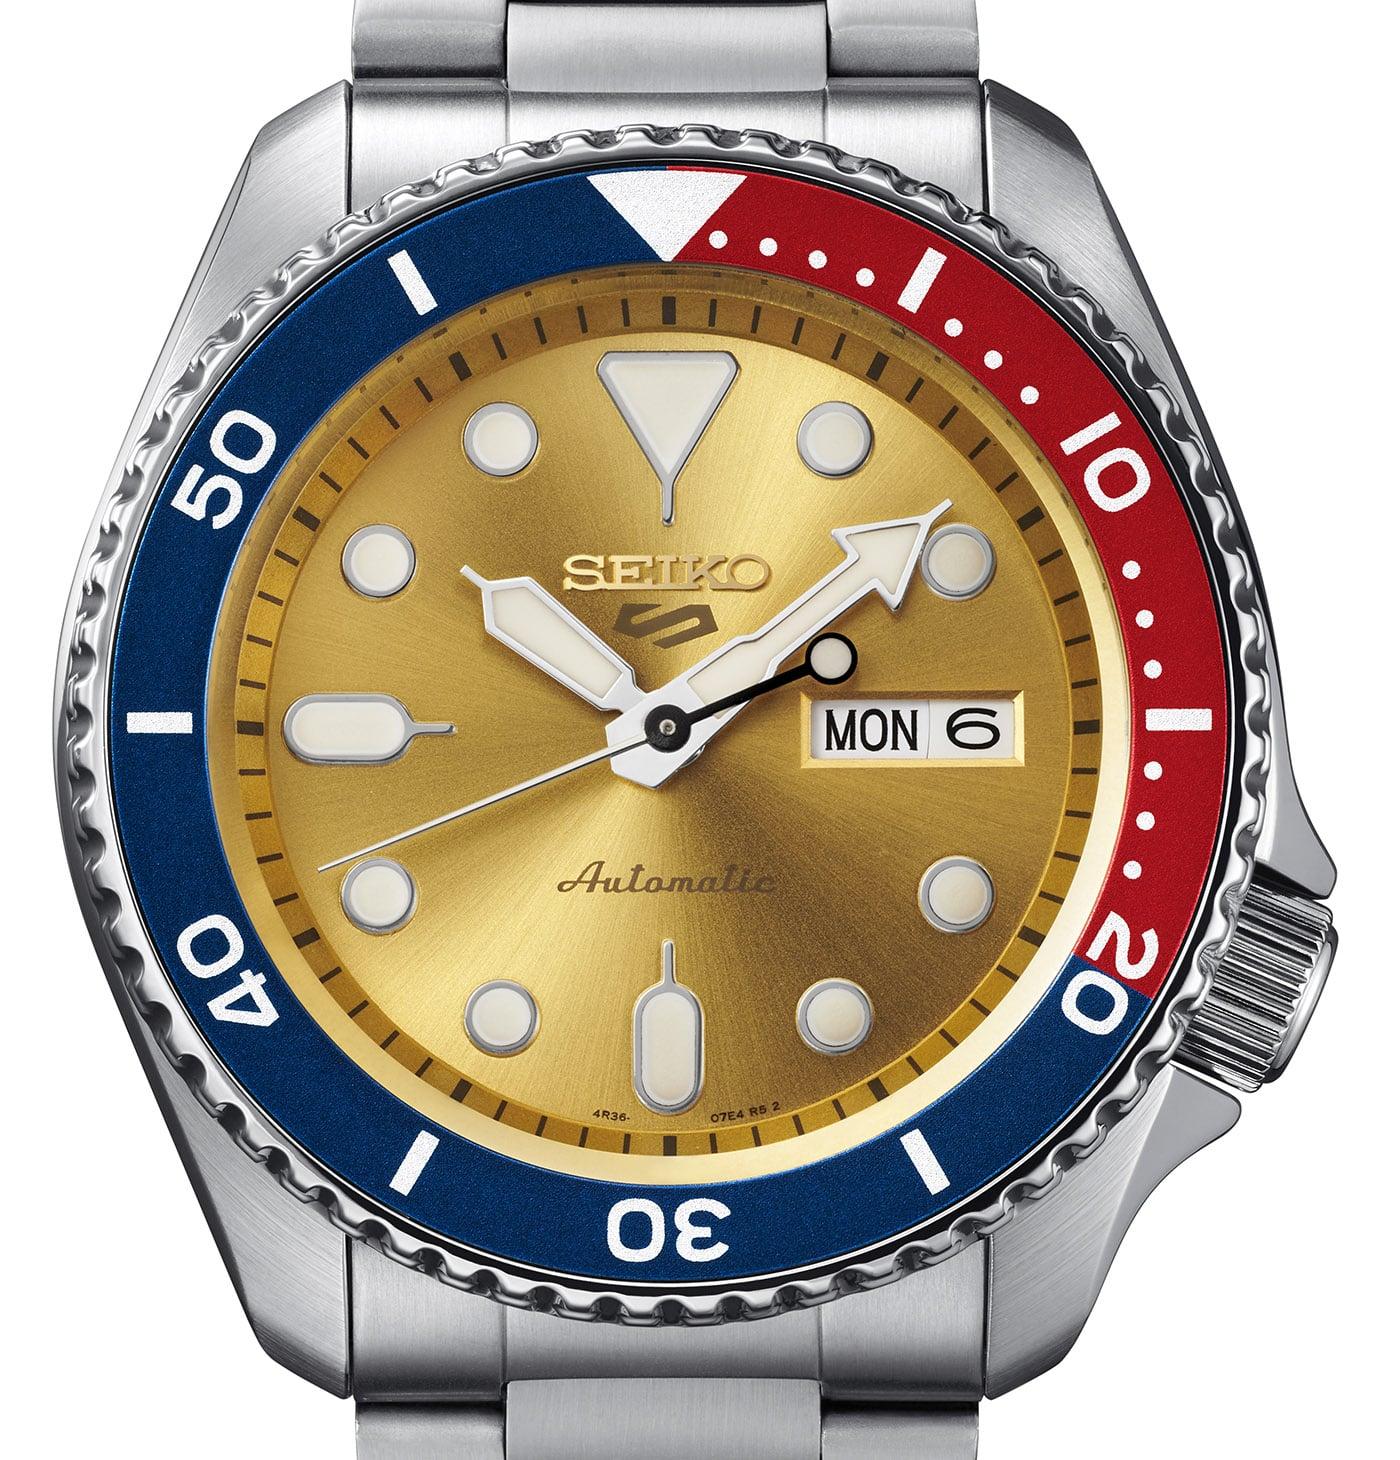 Seiko 5 Sports Custom Watch Beatmaker 2021 Limited Edition 4 min